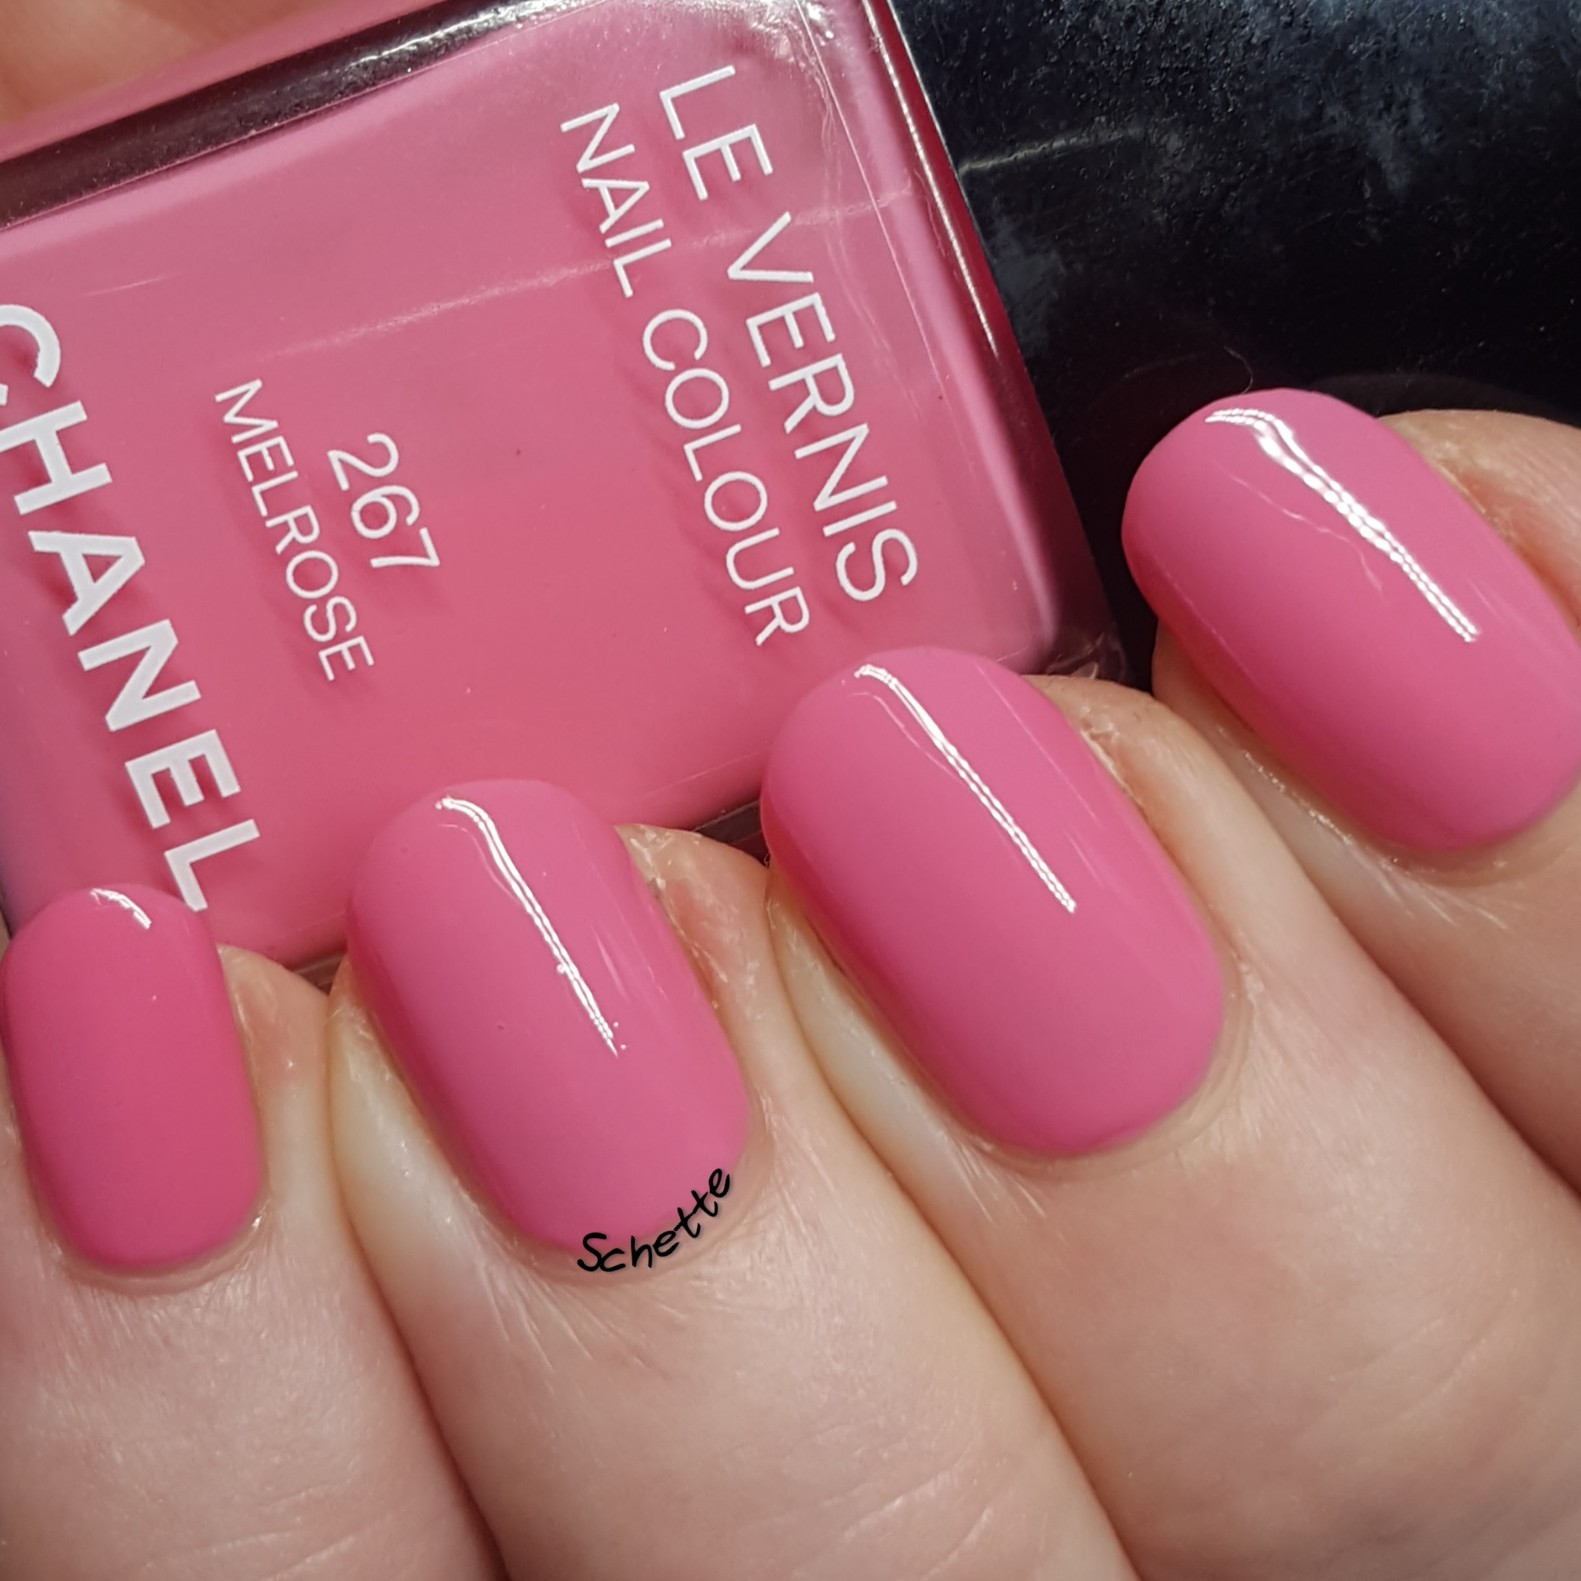 Chanel - Melrose